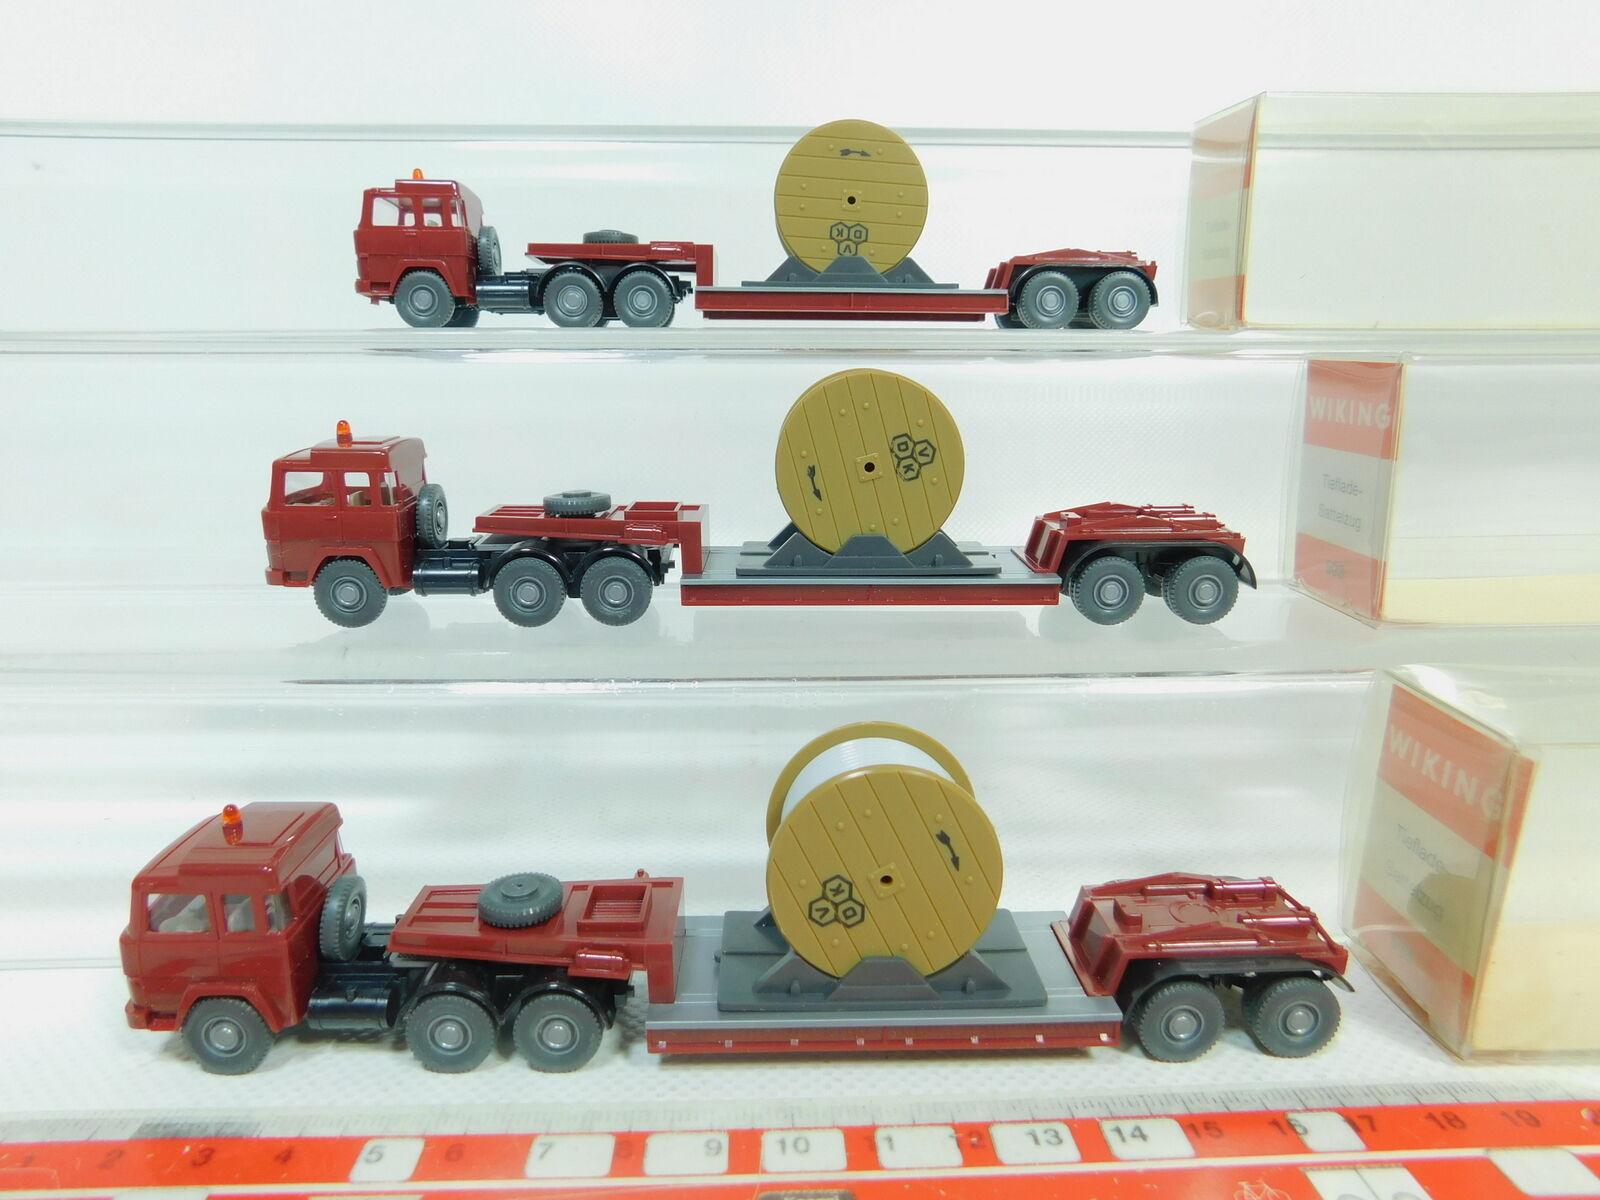 BO670-0,5  3x Wiking 1 87 503 Camión de de de Carga Baja Magirus-Deutz Vdk ,Muy Buen + 41c67d